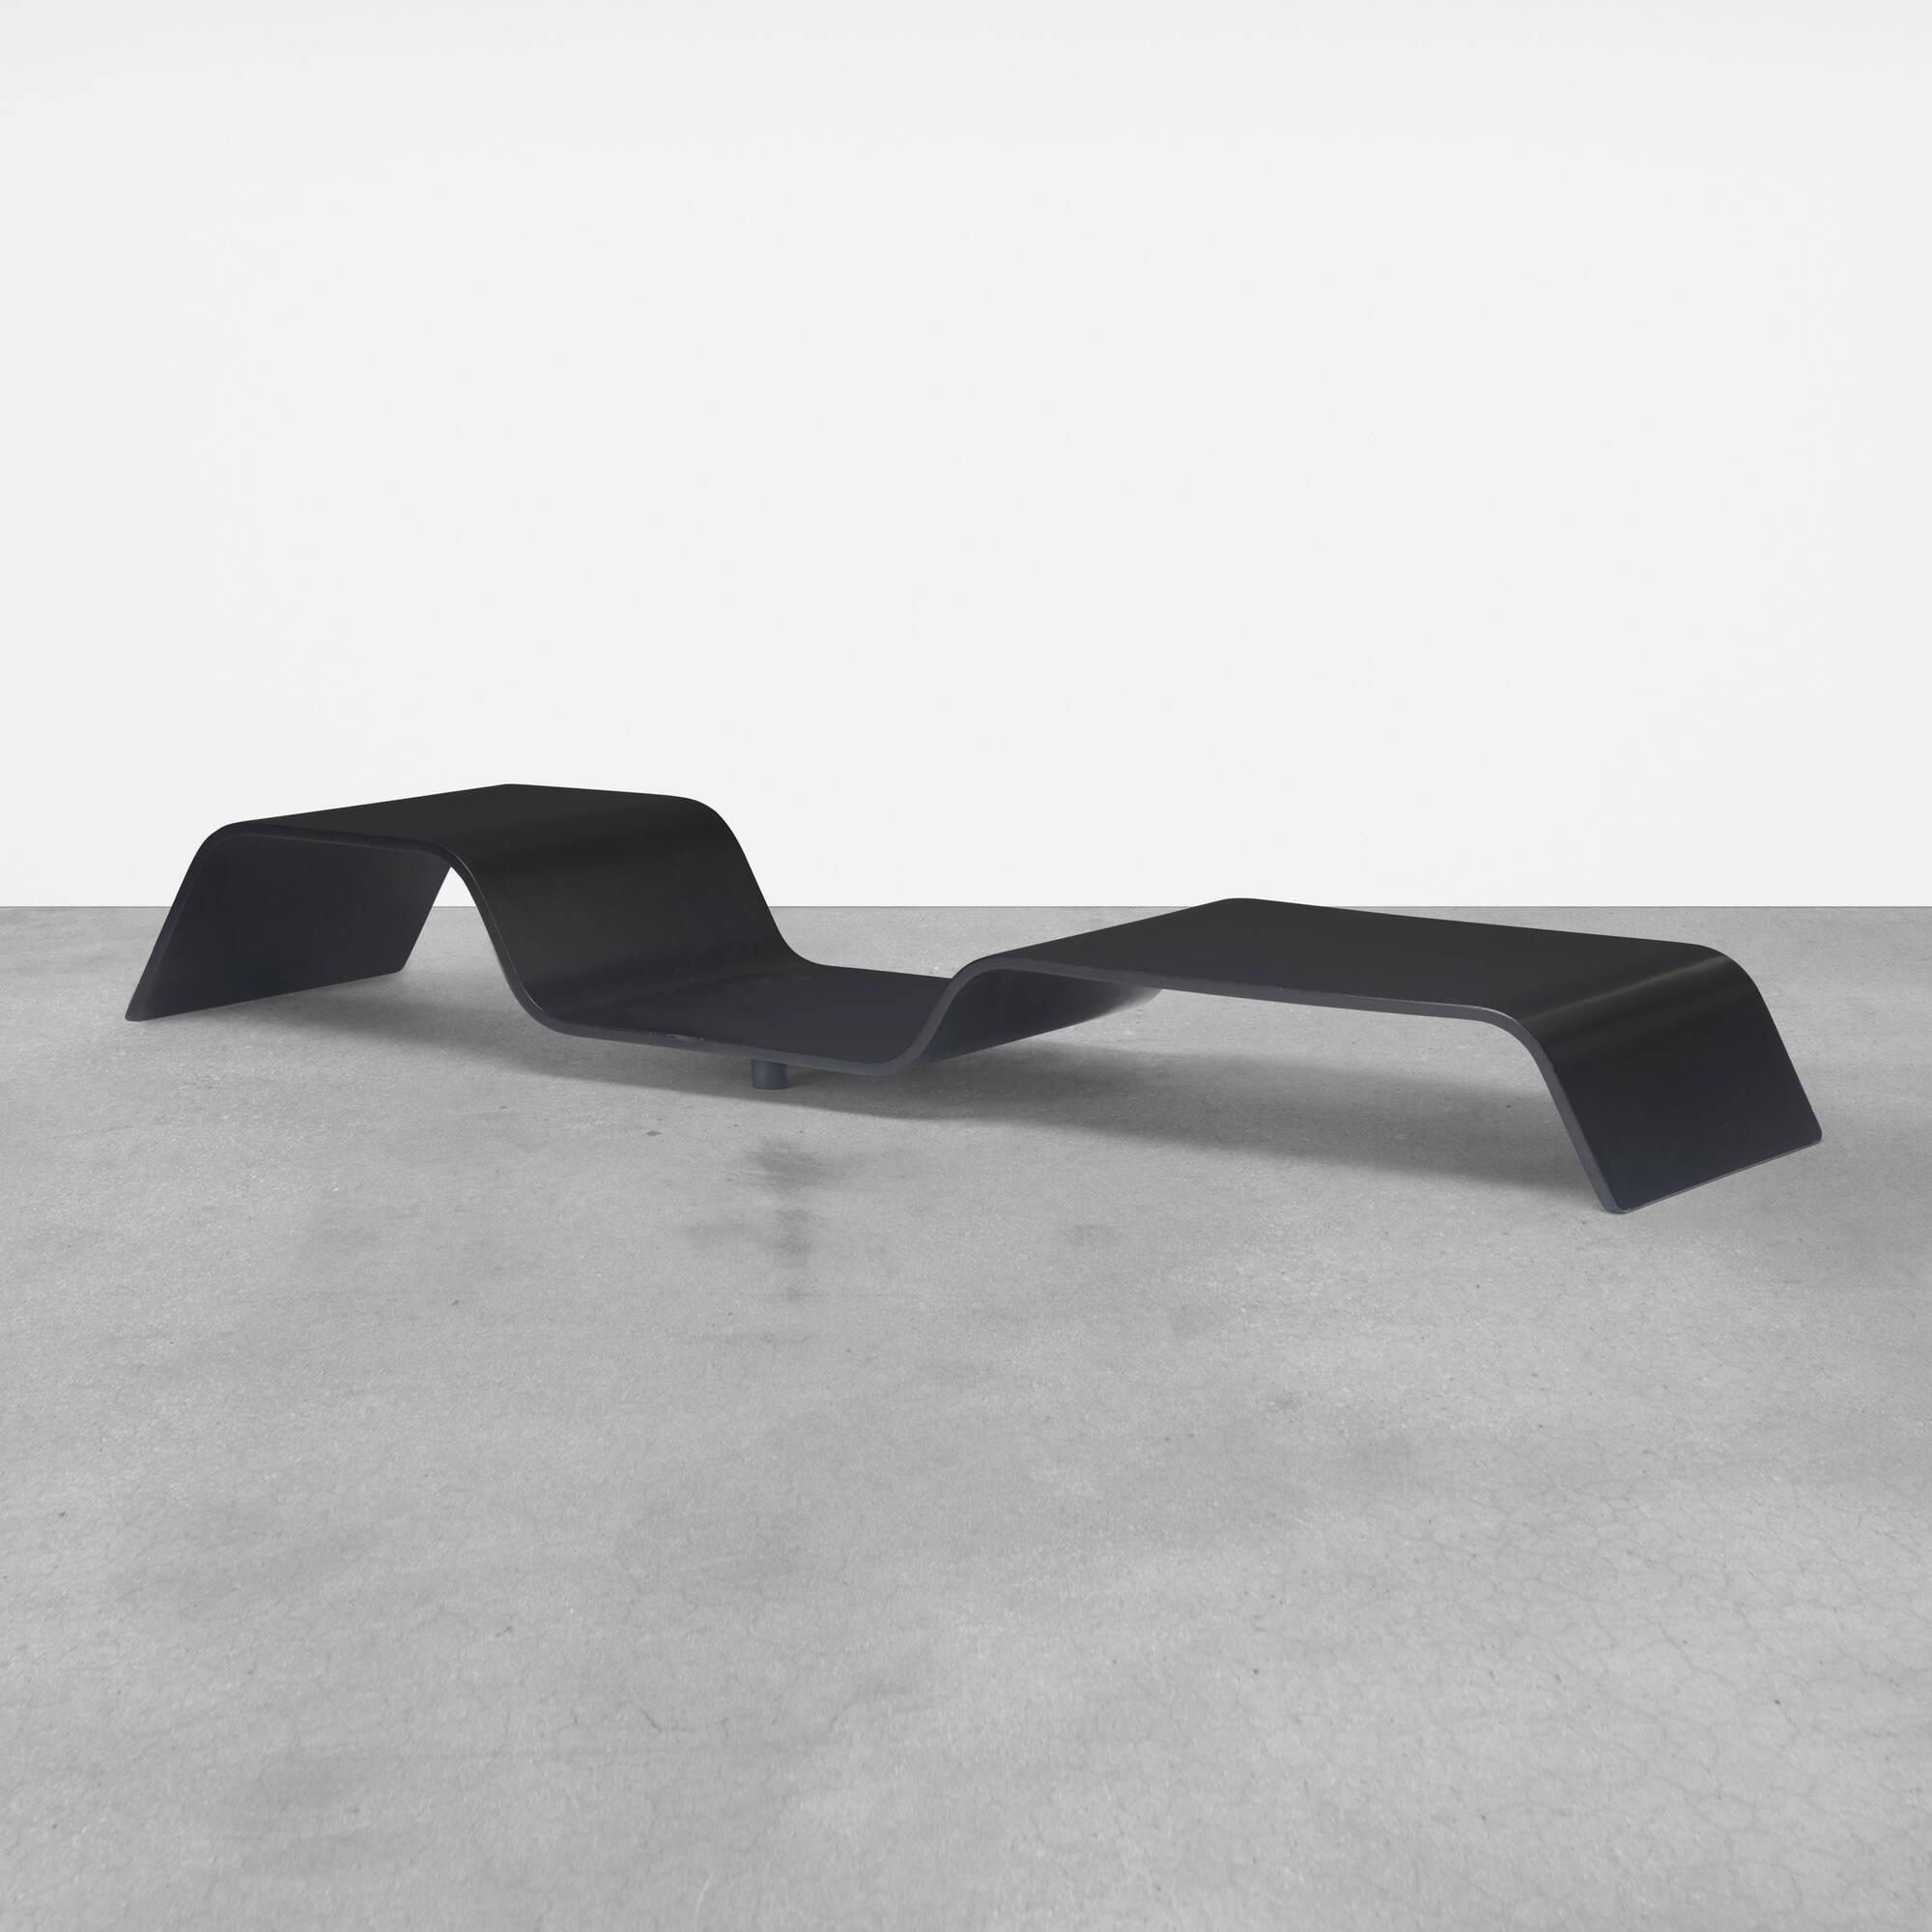 165: Oscar Niemeyer / low table (1 of 3)